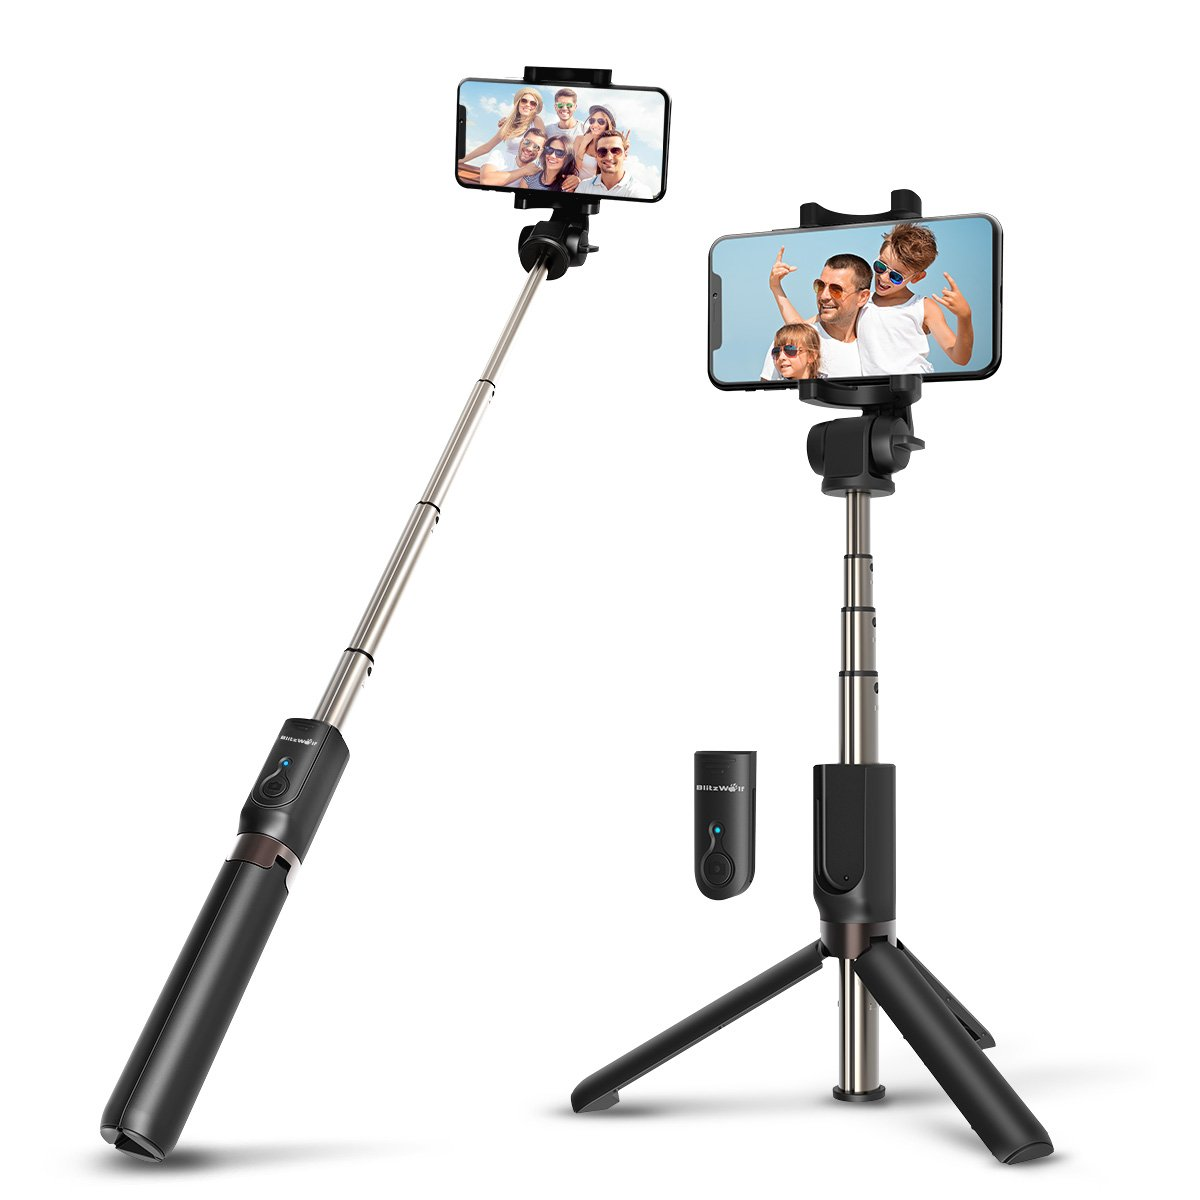 Mono-pod NX10 NX1000 NX11 Galaxy NX NX1100 Cameras: Collapsible Mono pod GX-20 GX-1S NX100 Sturdy 72 Monopod Camera Stick with Quick Release for Samsung EX2F NX1 GX-1L GX-10